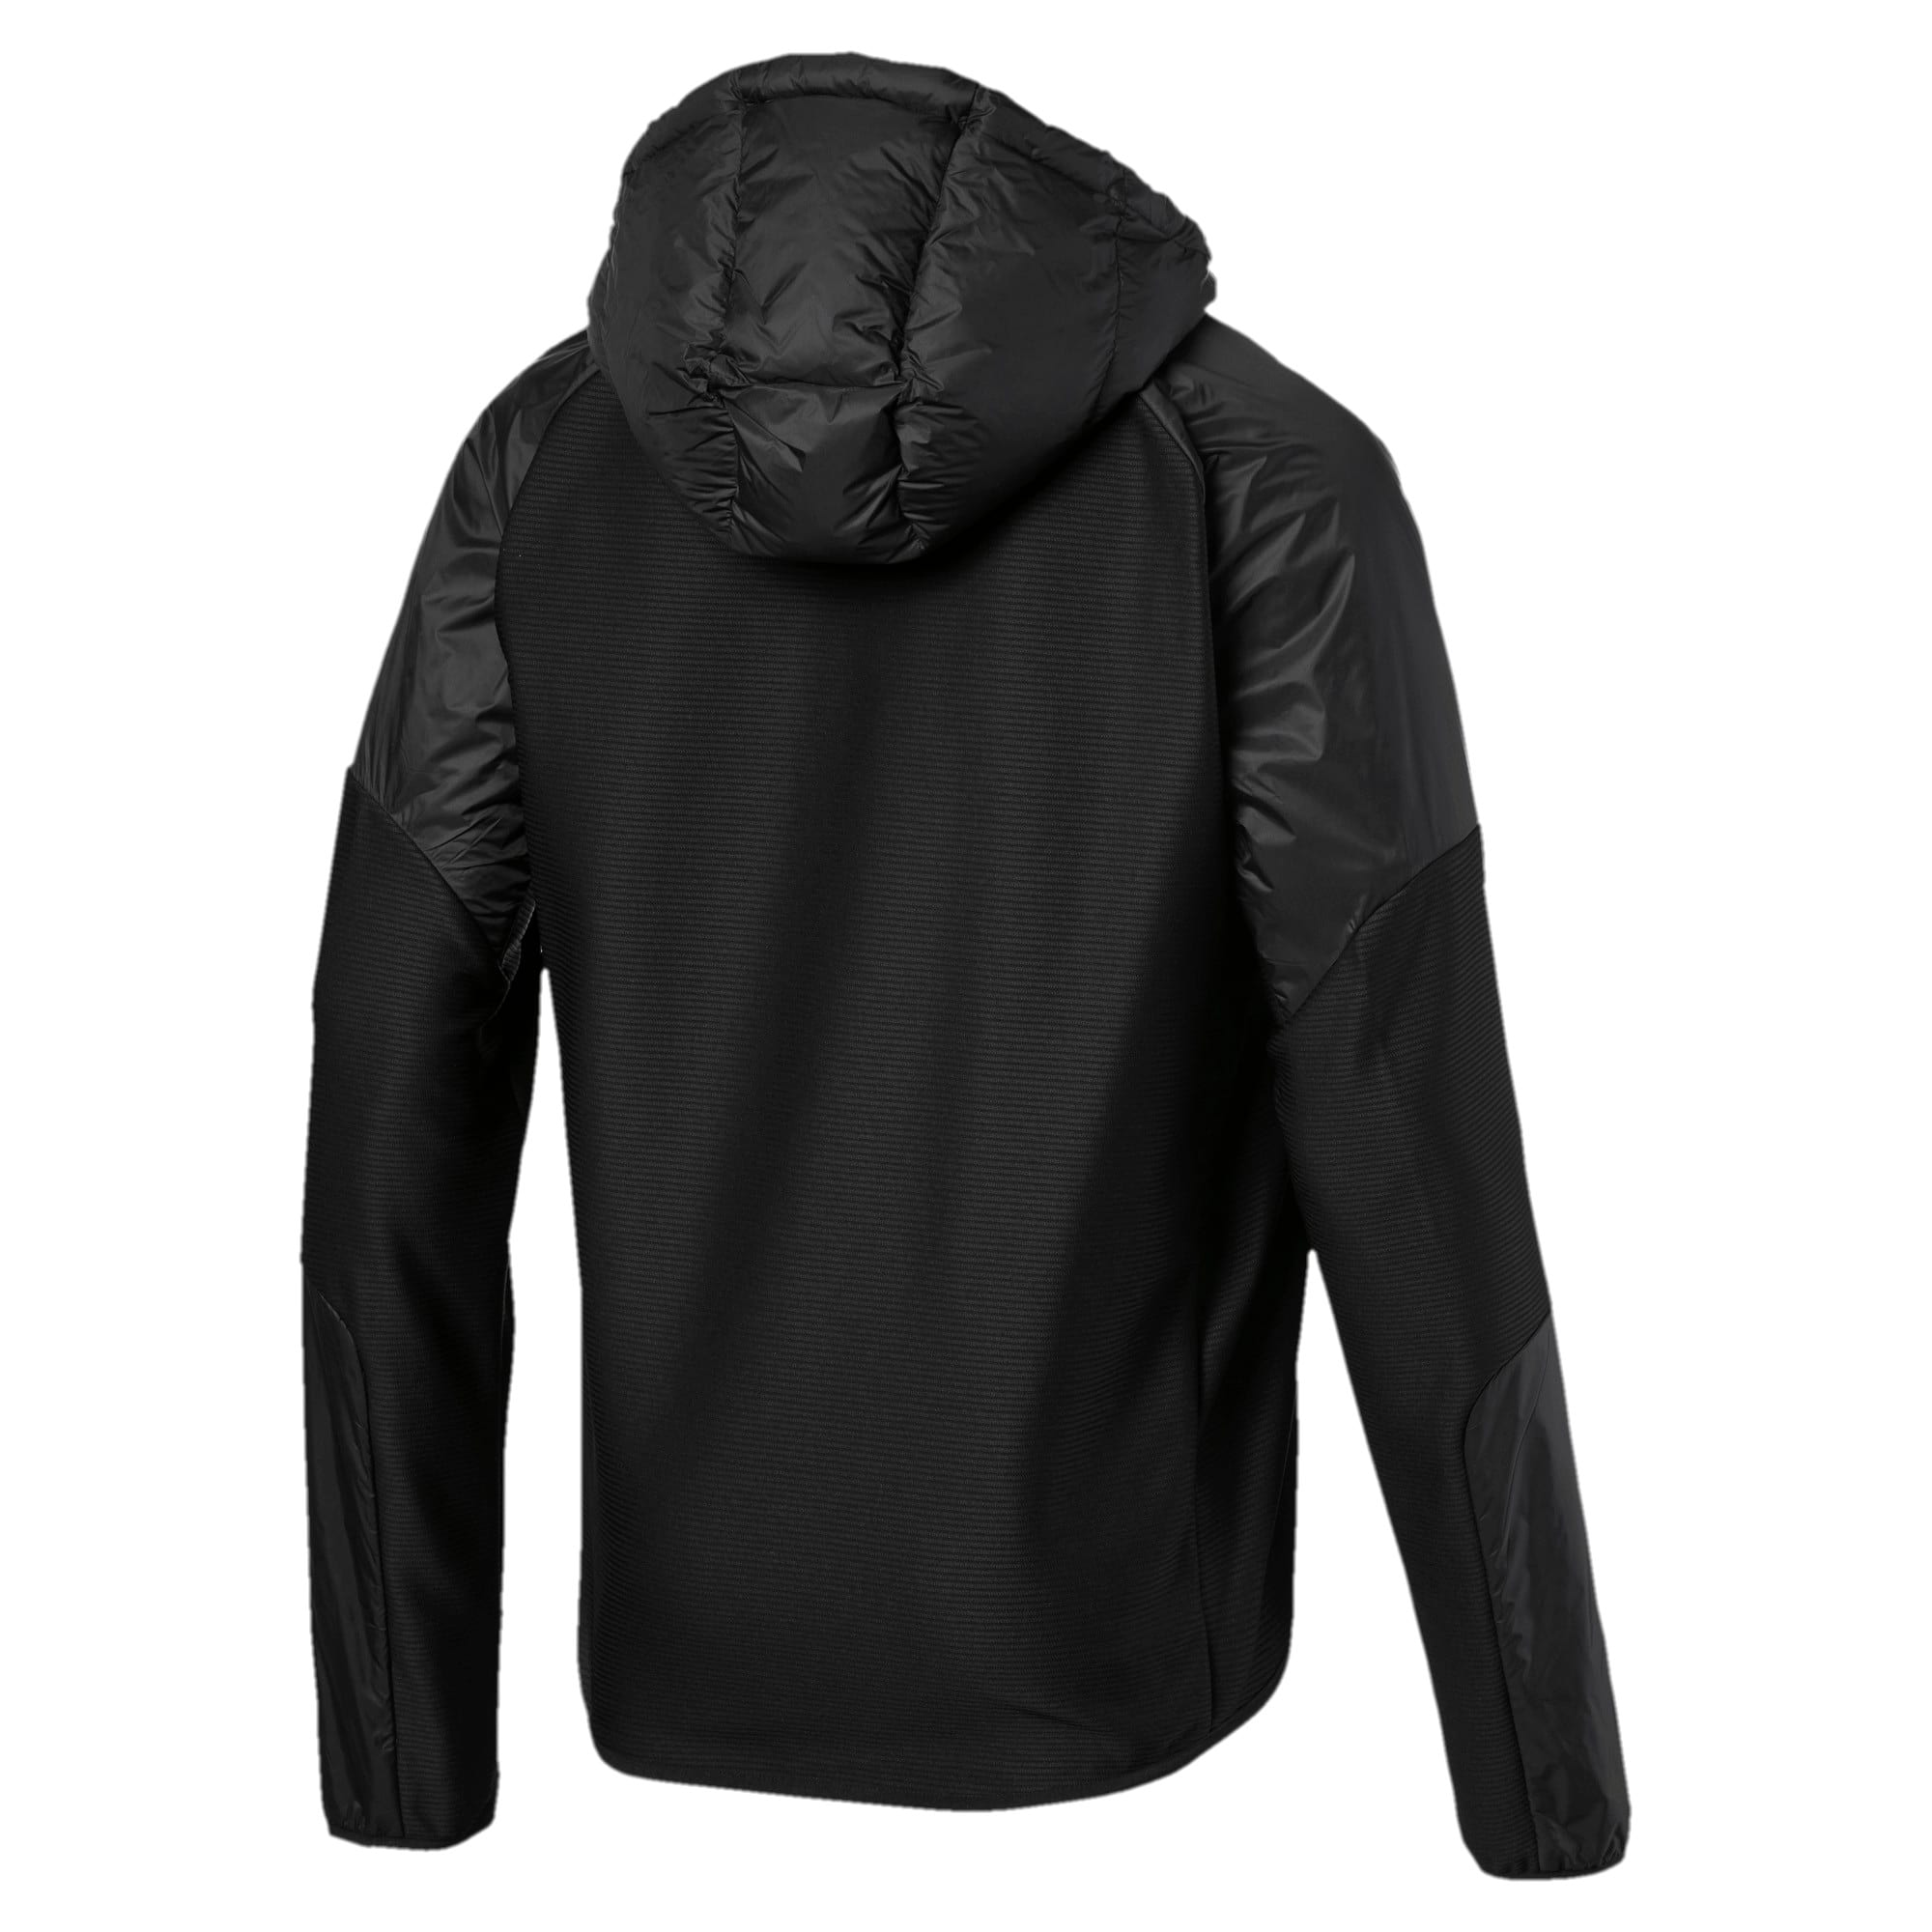 Thumbnail 5 of 600 Hybrid Down Men's Jacket, Puma Black, medium